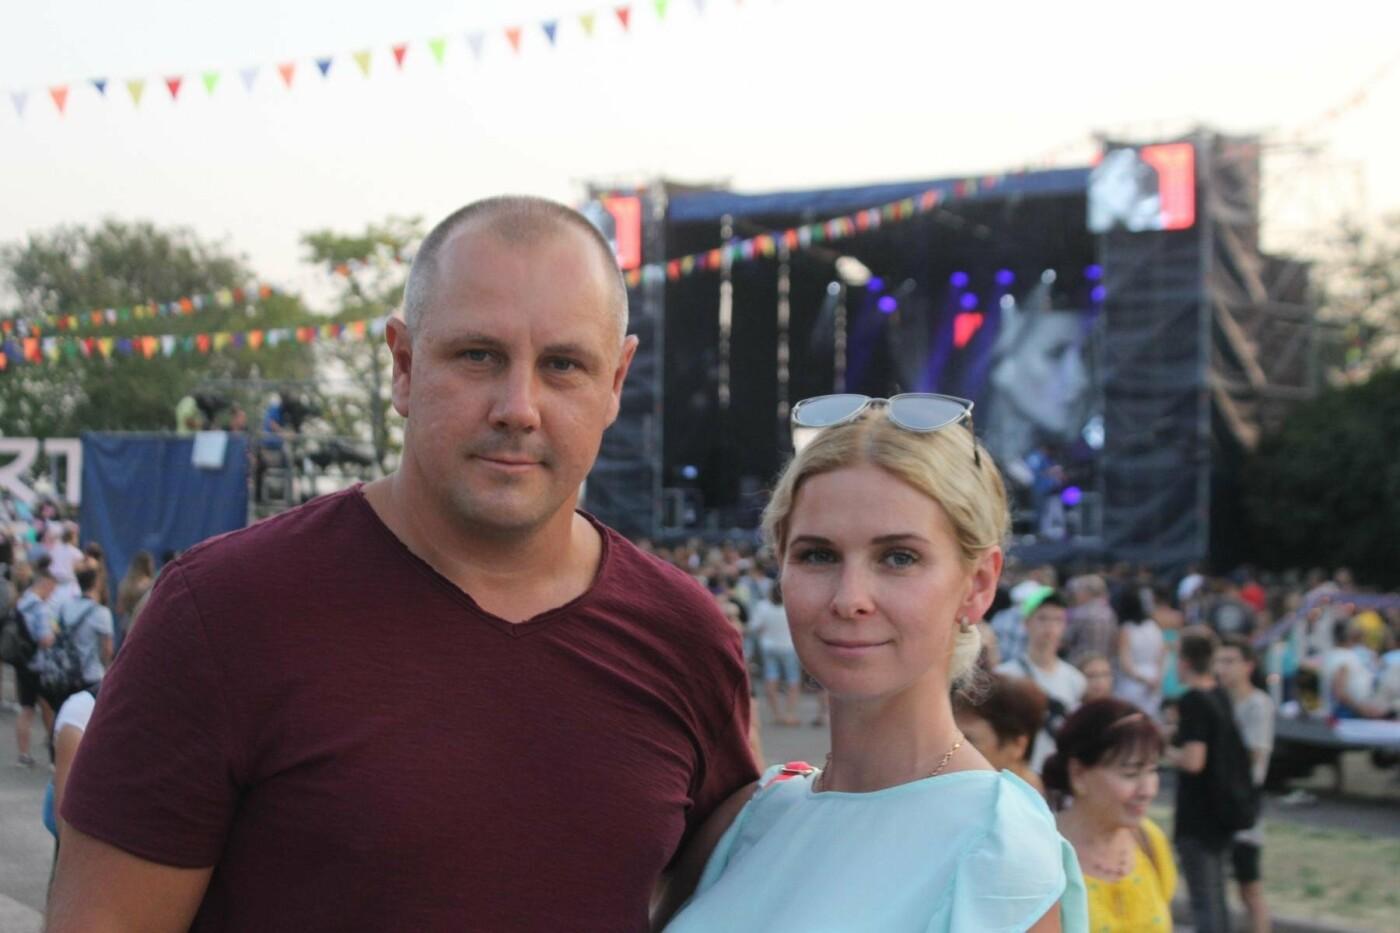 Найди себя: 50 портретов посетителей фестиваля Khortytsia Freedom, – ФОТОРЕПОРТАЖ, фото-15